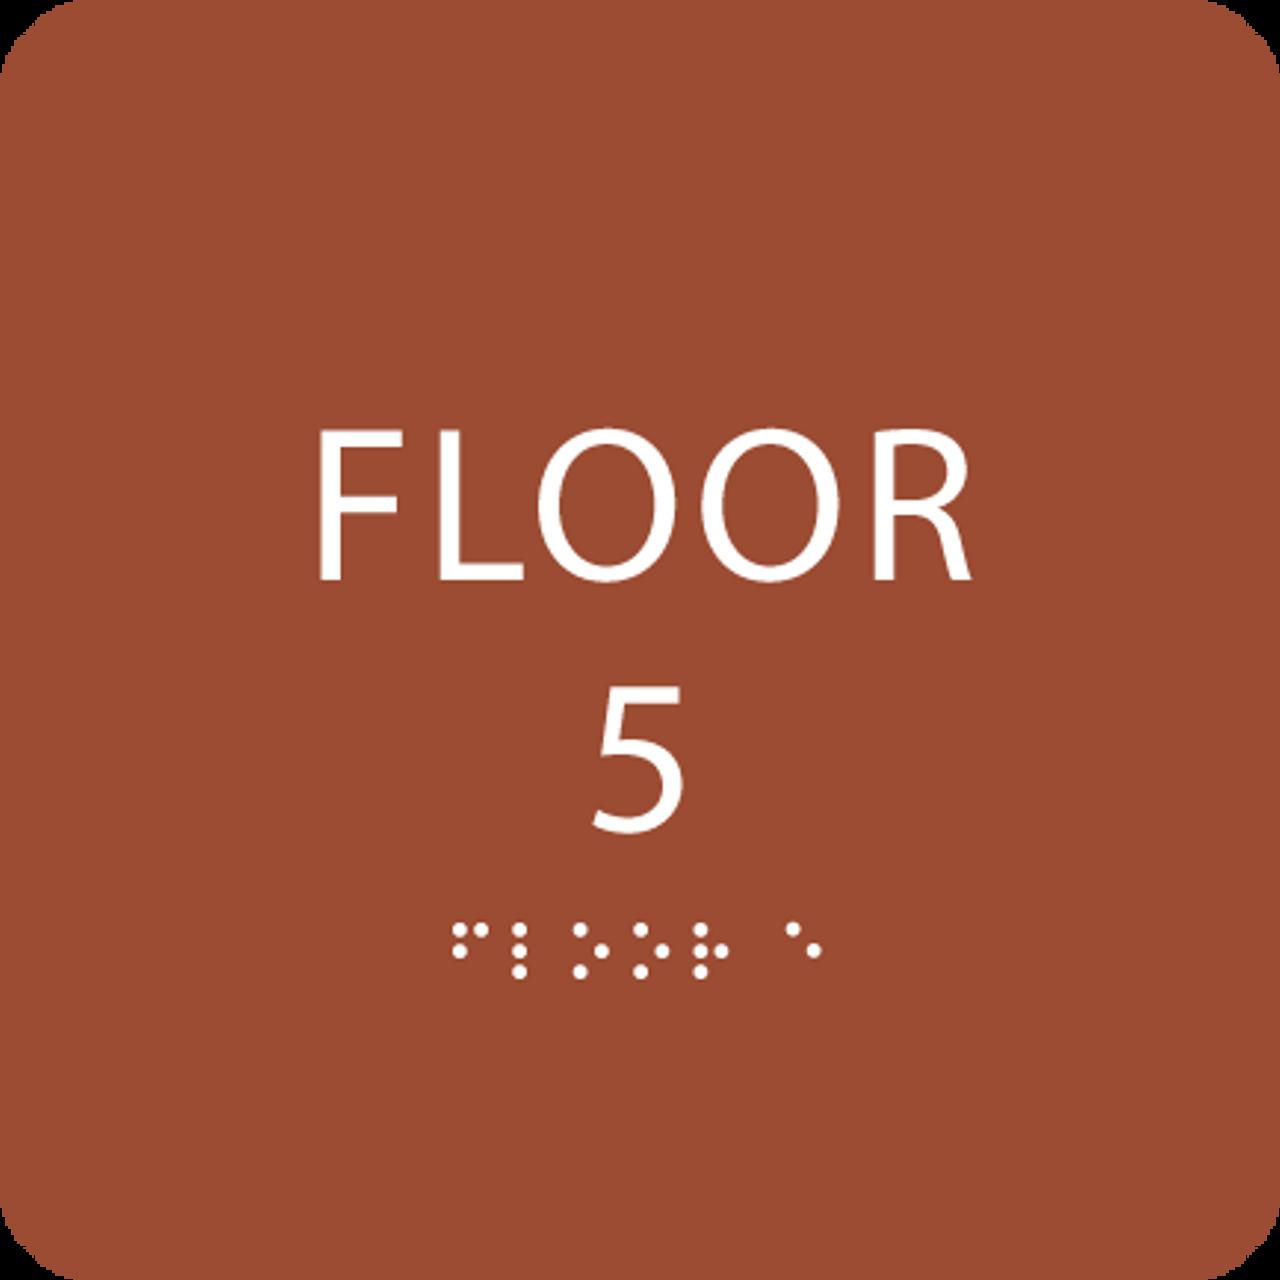 Orange Floor 5 Level Identification Sign